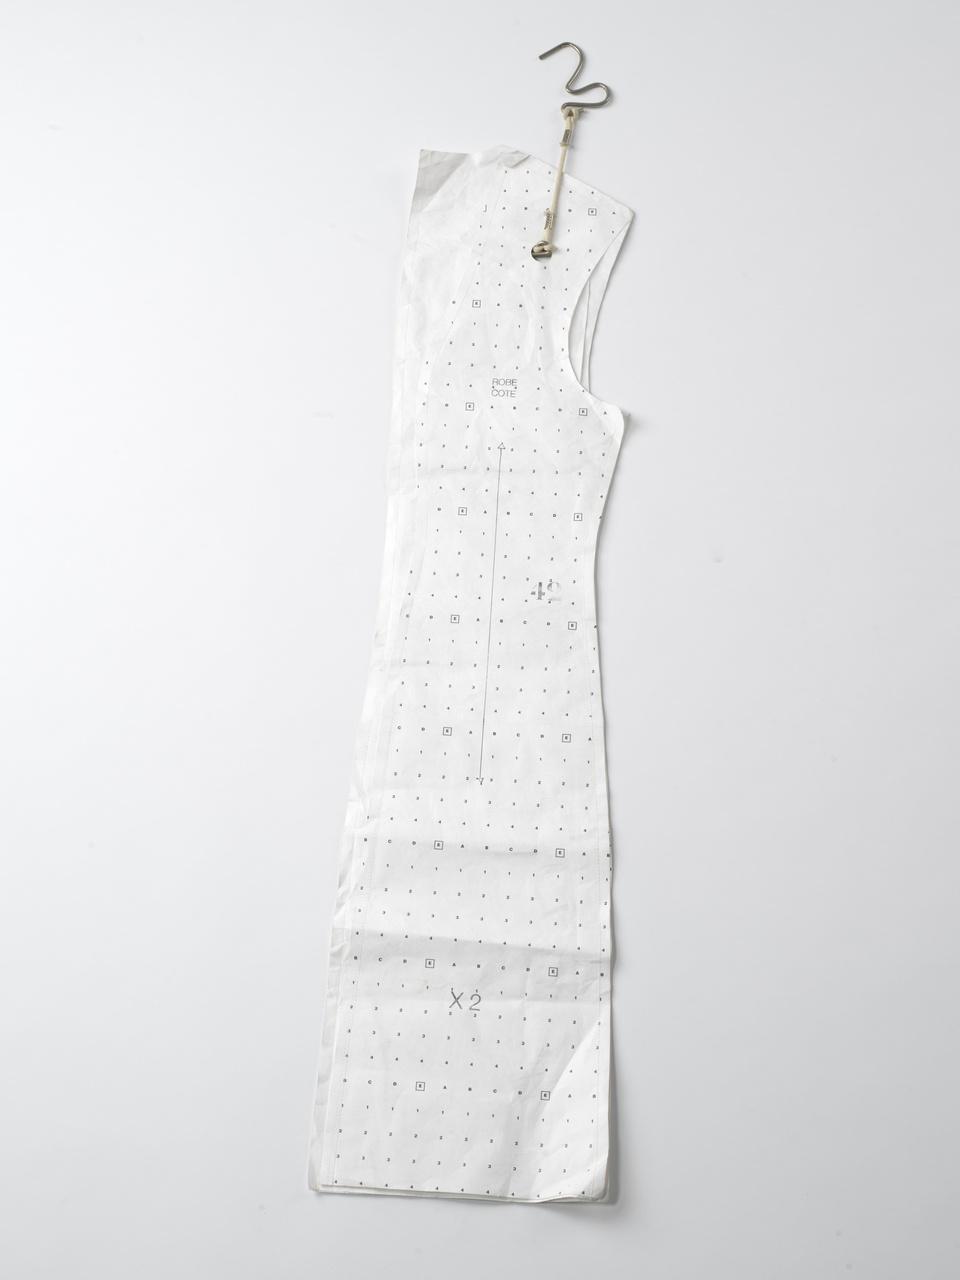 patroon damesjurk Flat Garment 1997-1998